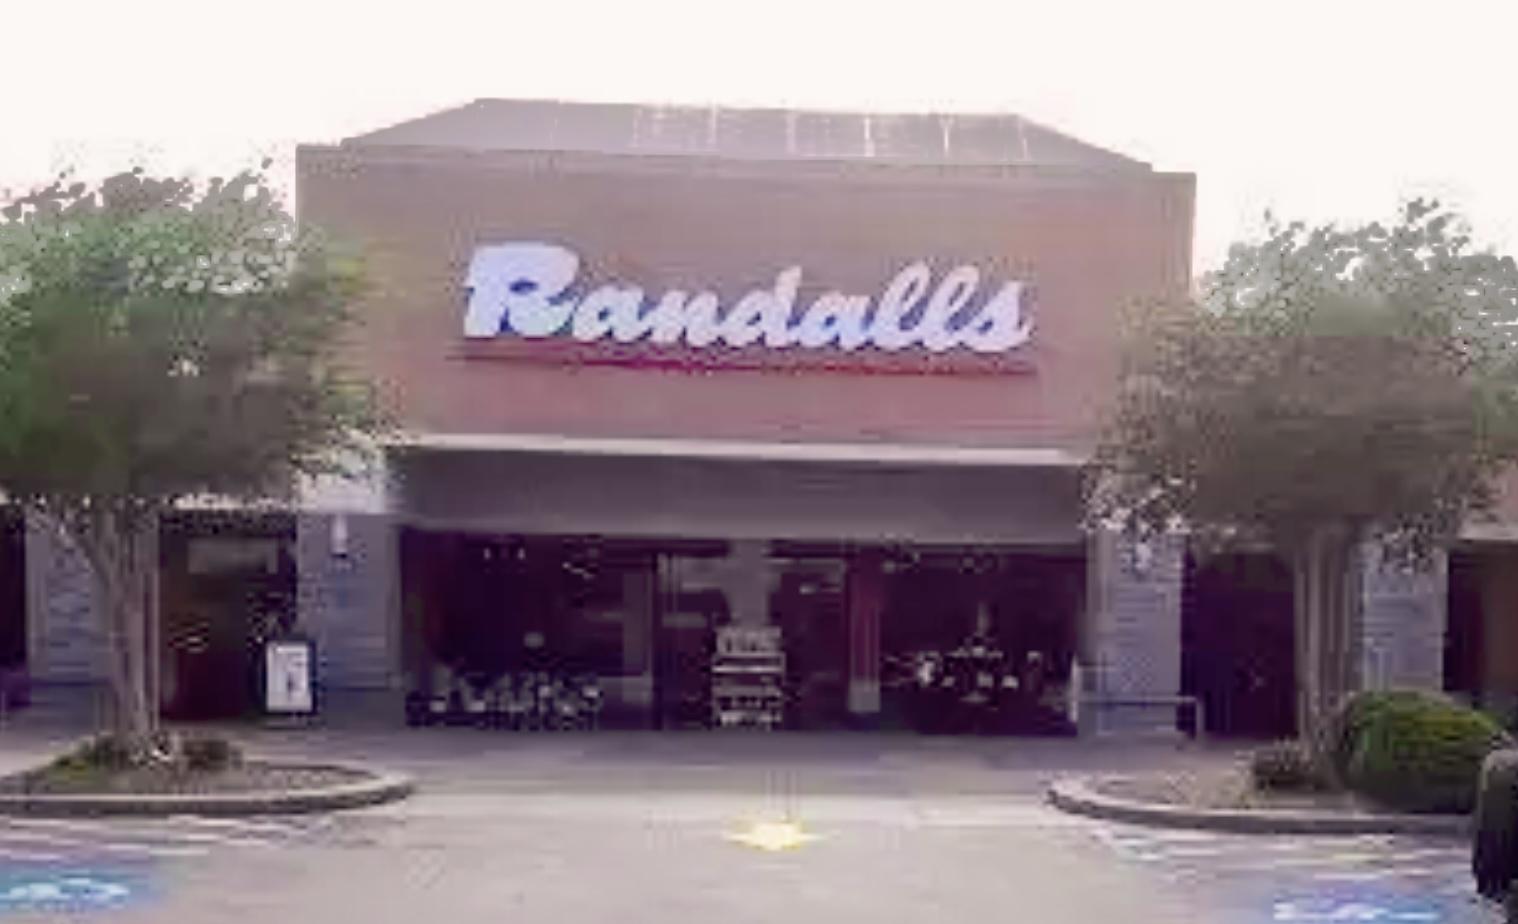 Bellaire Randalls set to close next month; is 'urban village' ahead?